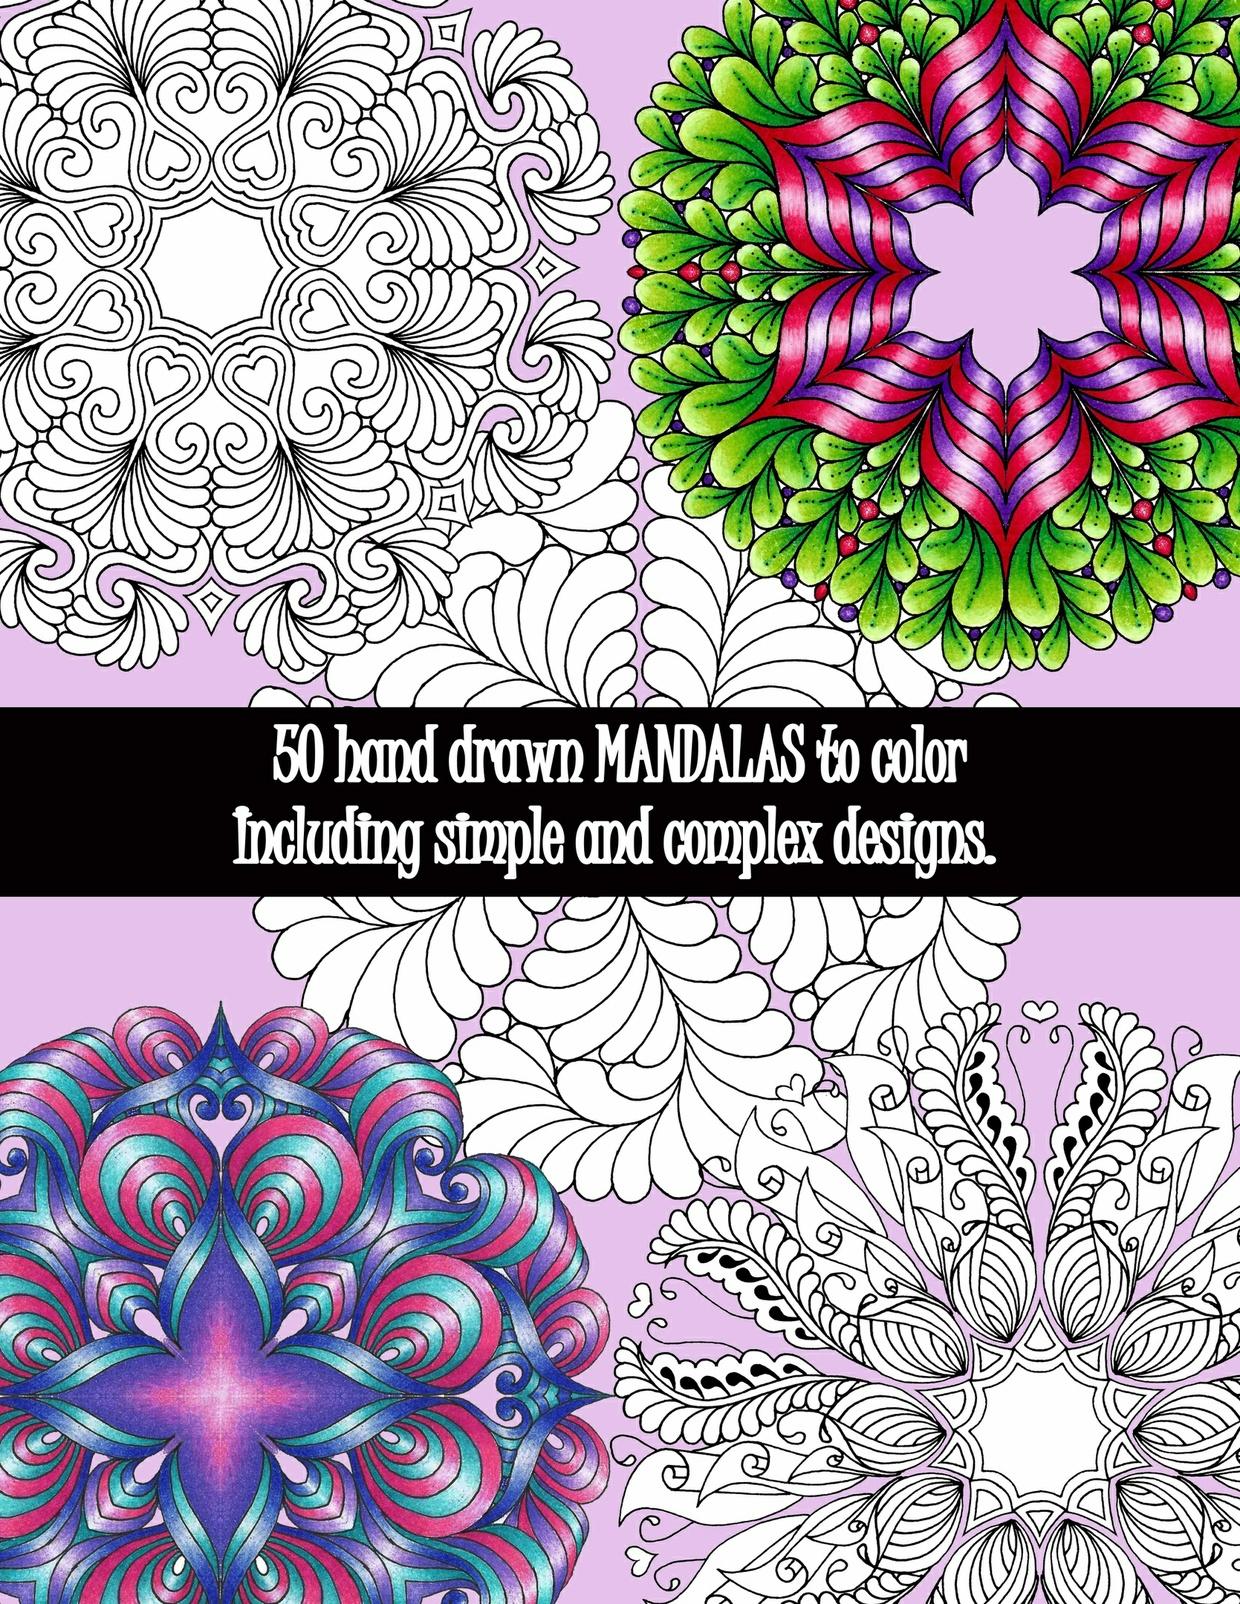 Majestic Mandalas SERIES (3 full PDF books)